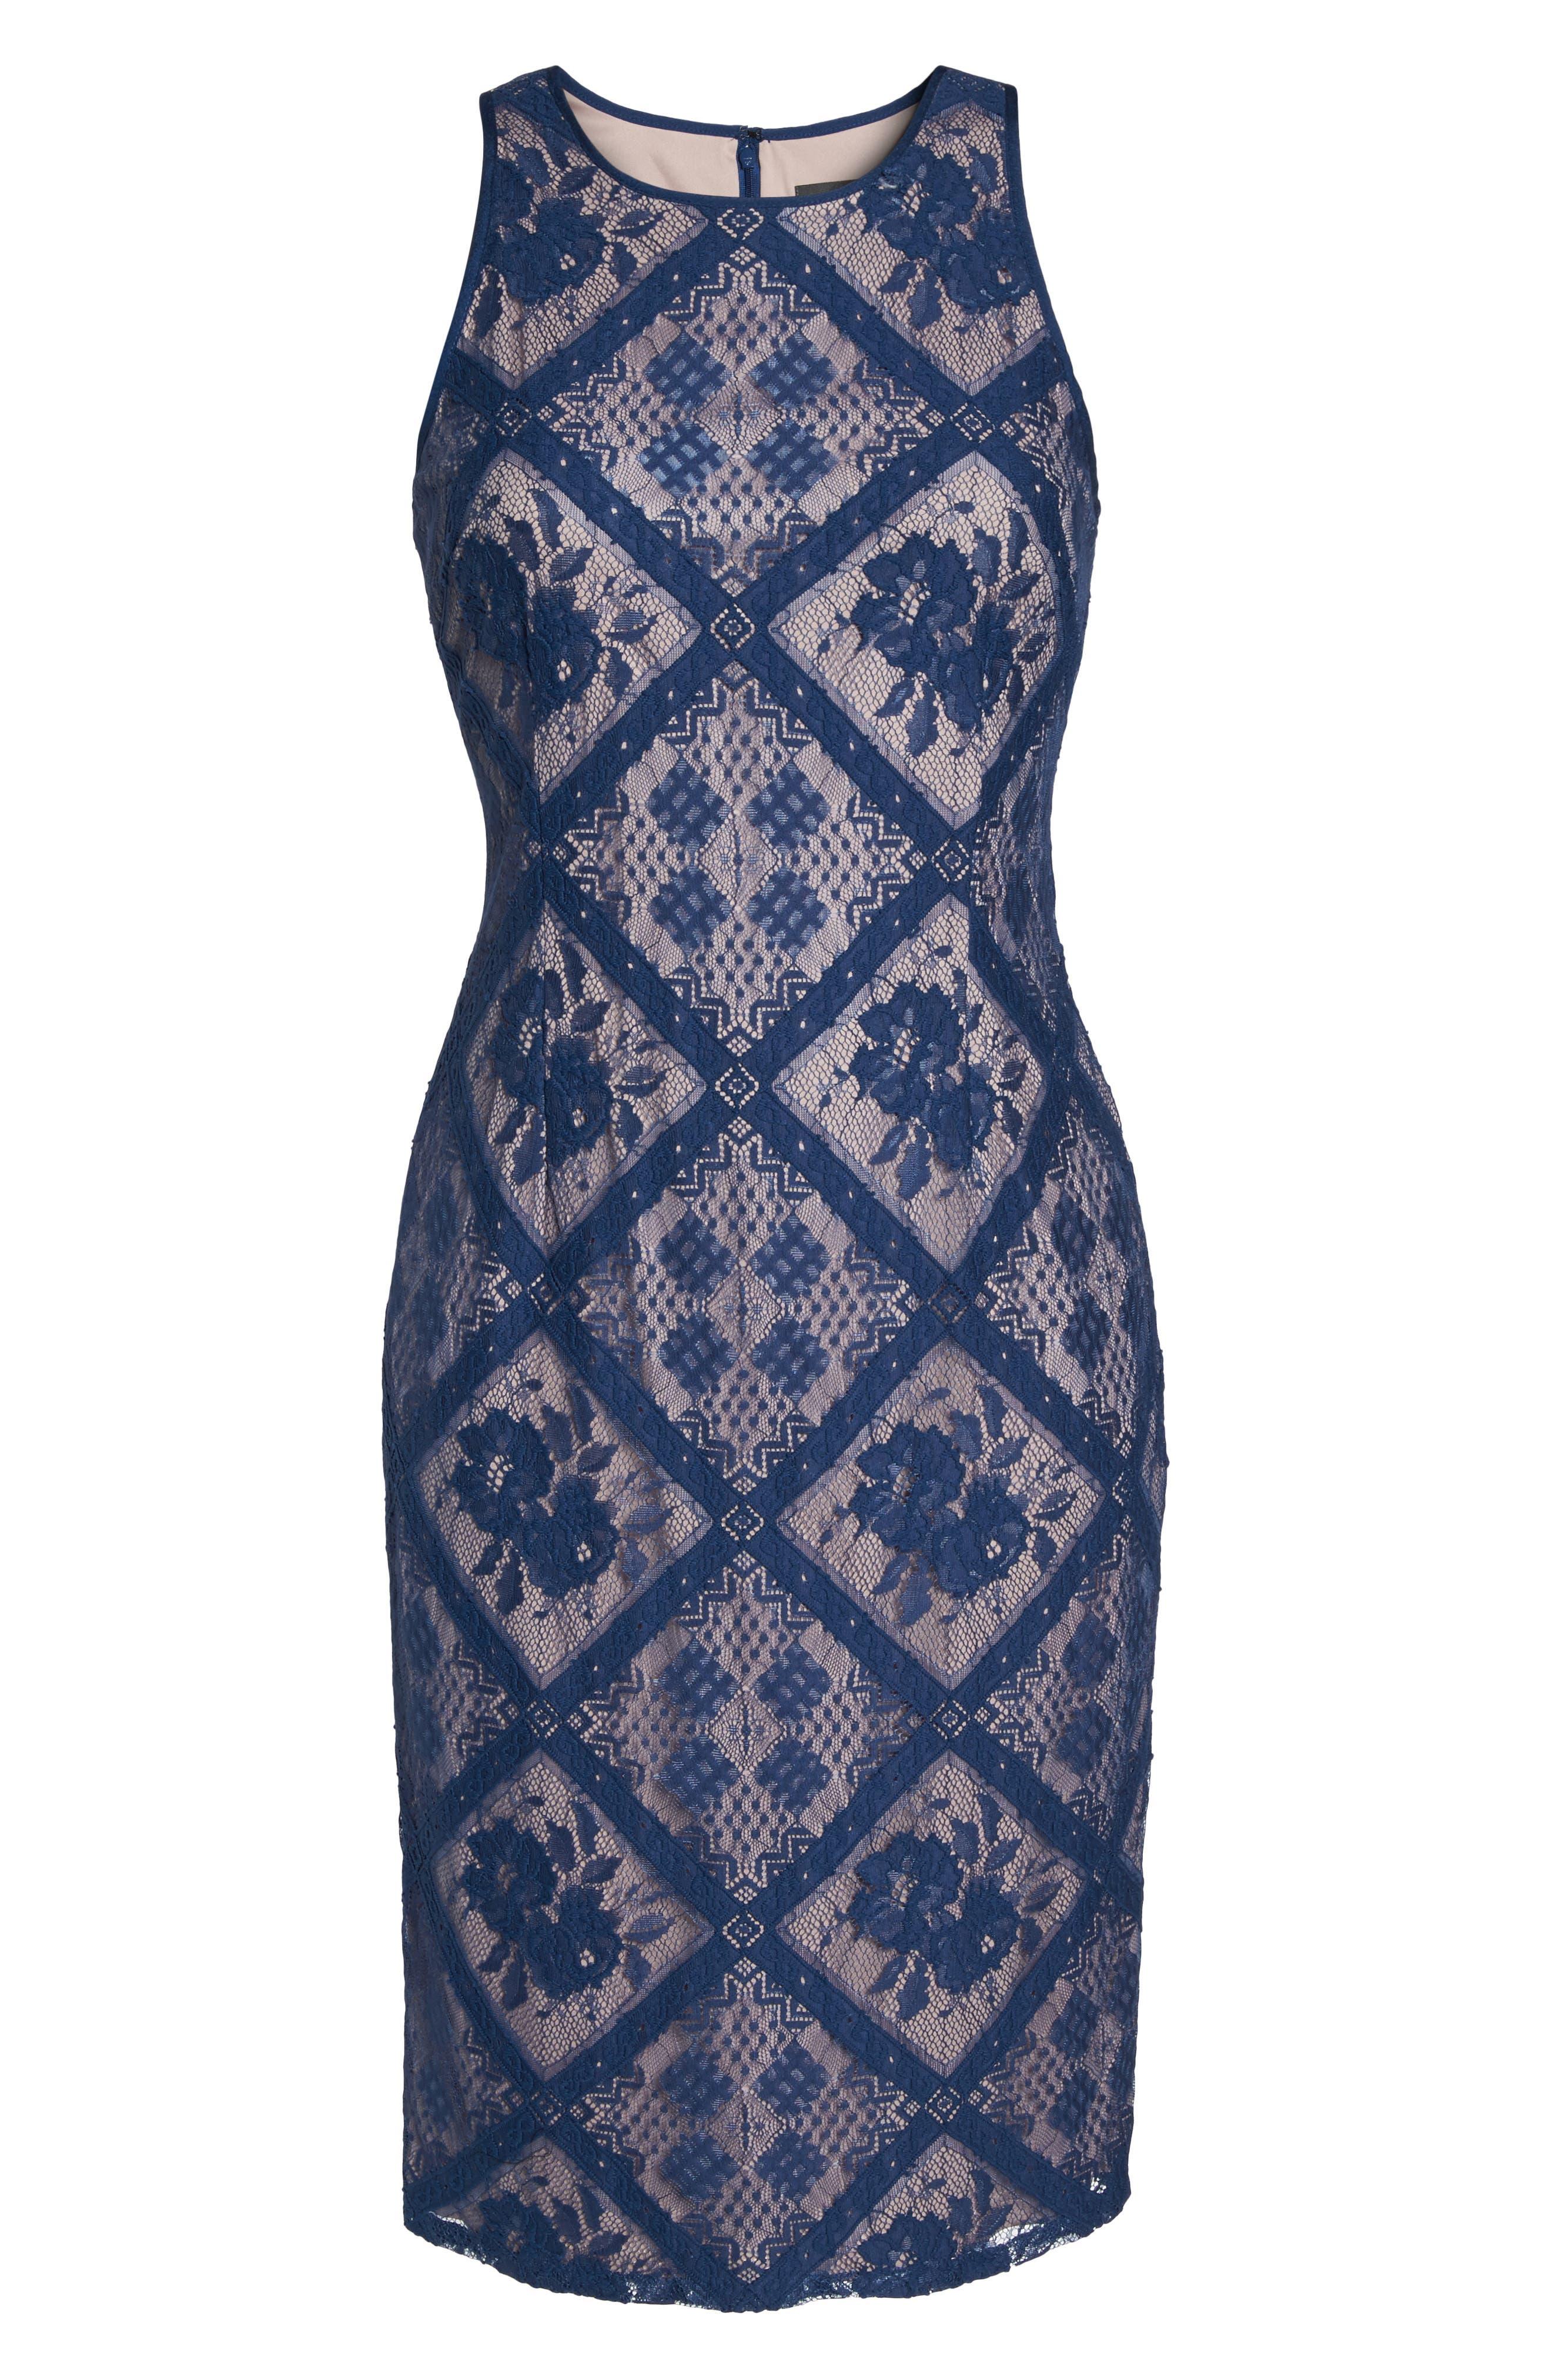 Floral Lace Sheath Dress,                             Alternate thumbnail 6, color,                             Navy Sateen